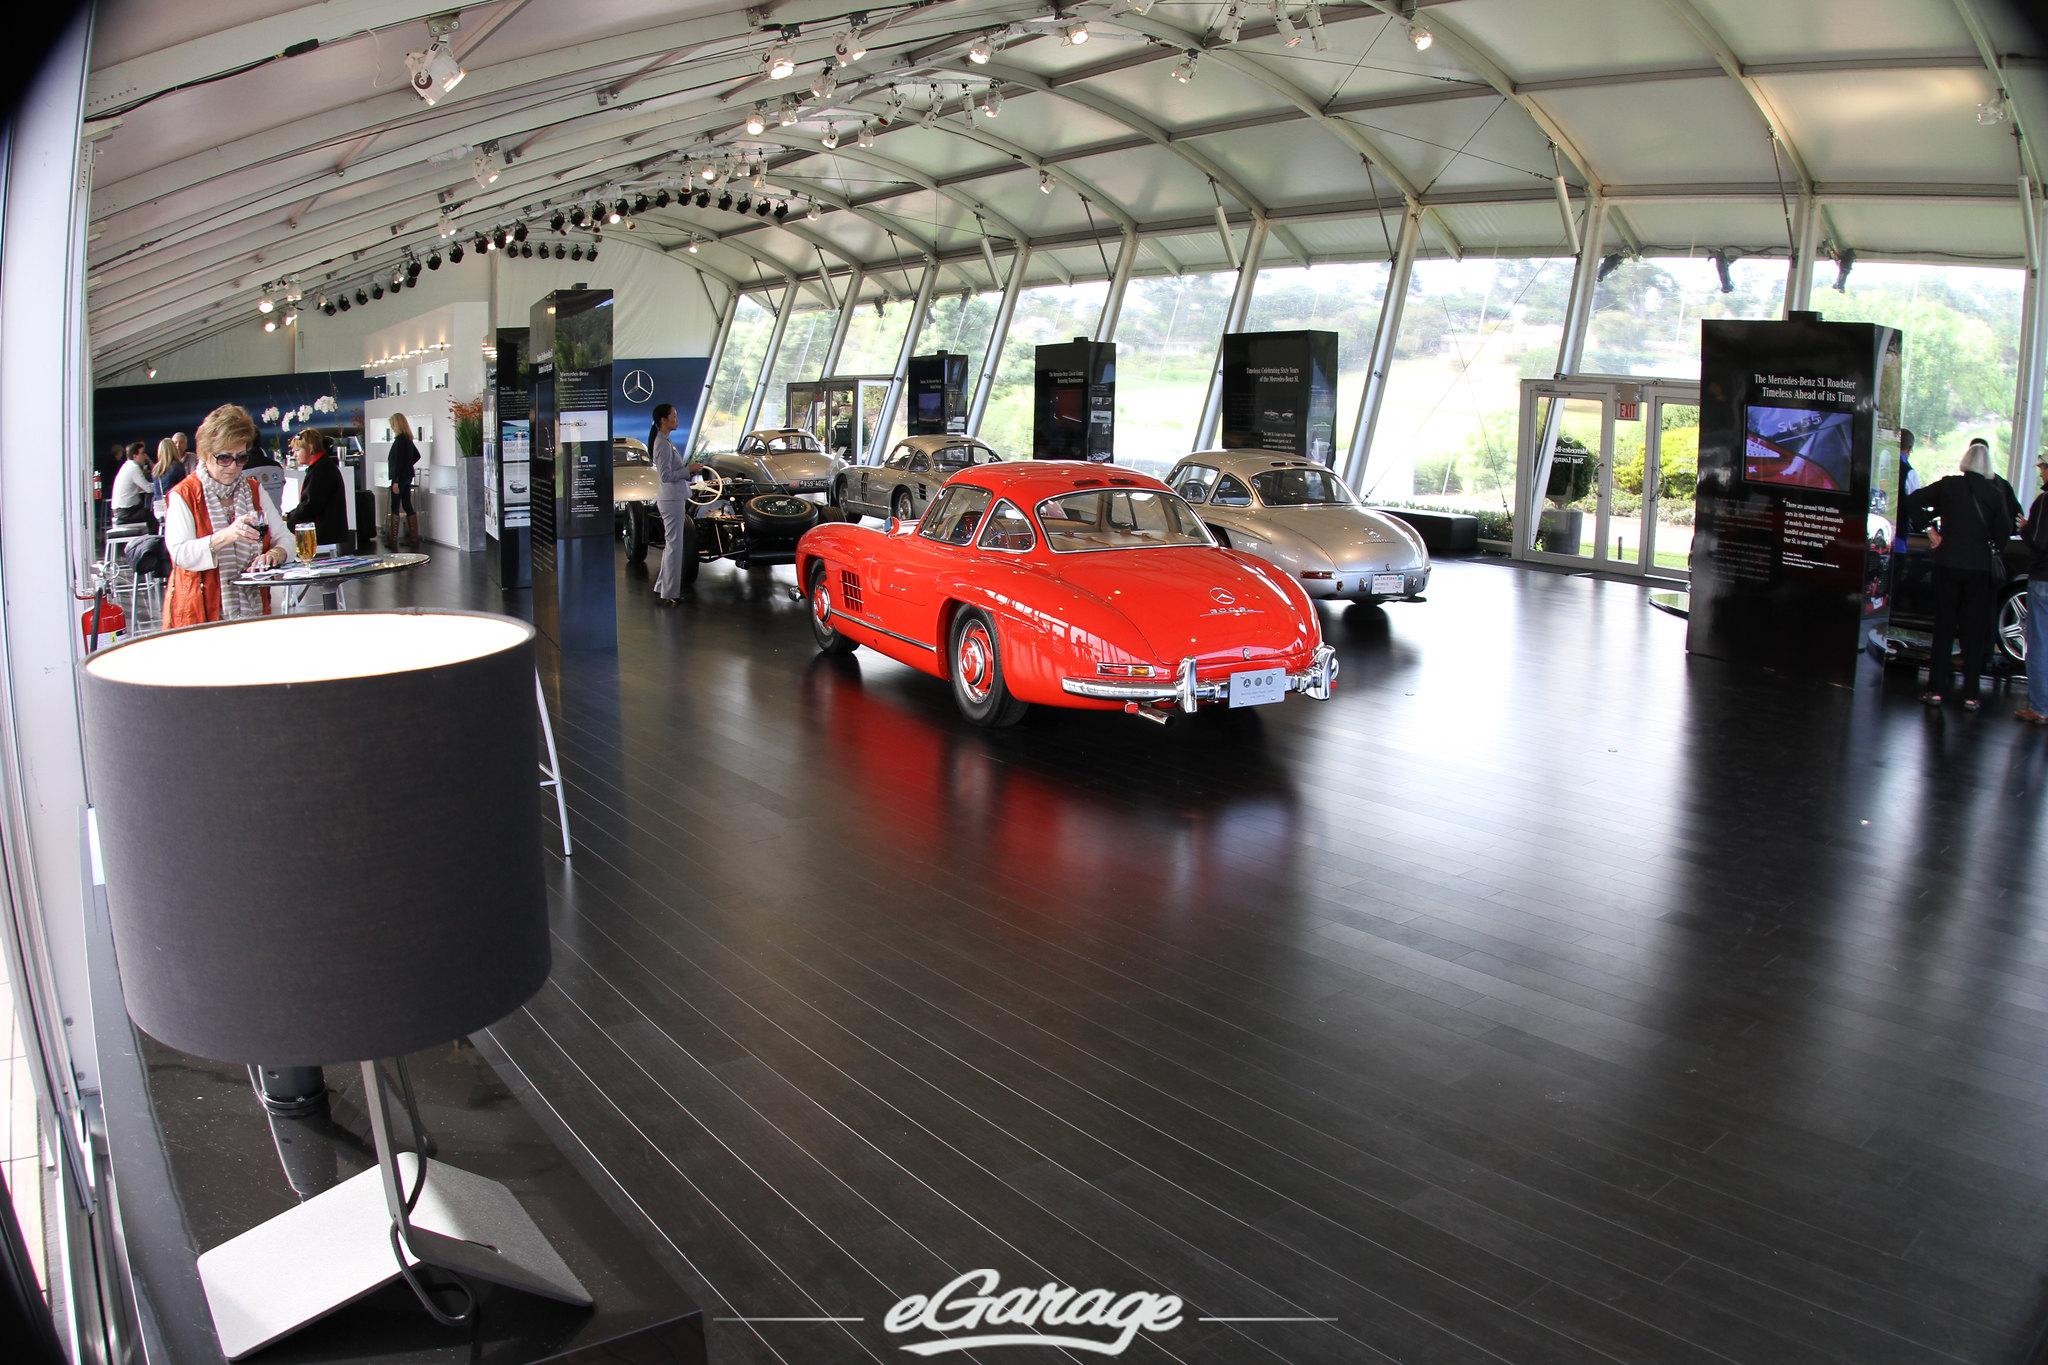 7828730820 96f7fa2b74 k Mercedes Benz Classic